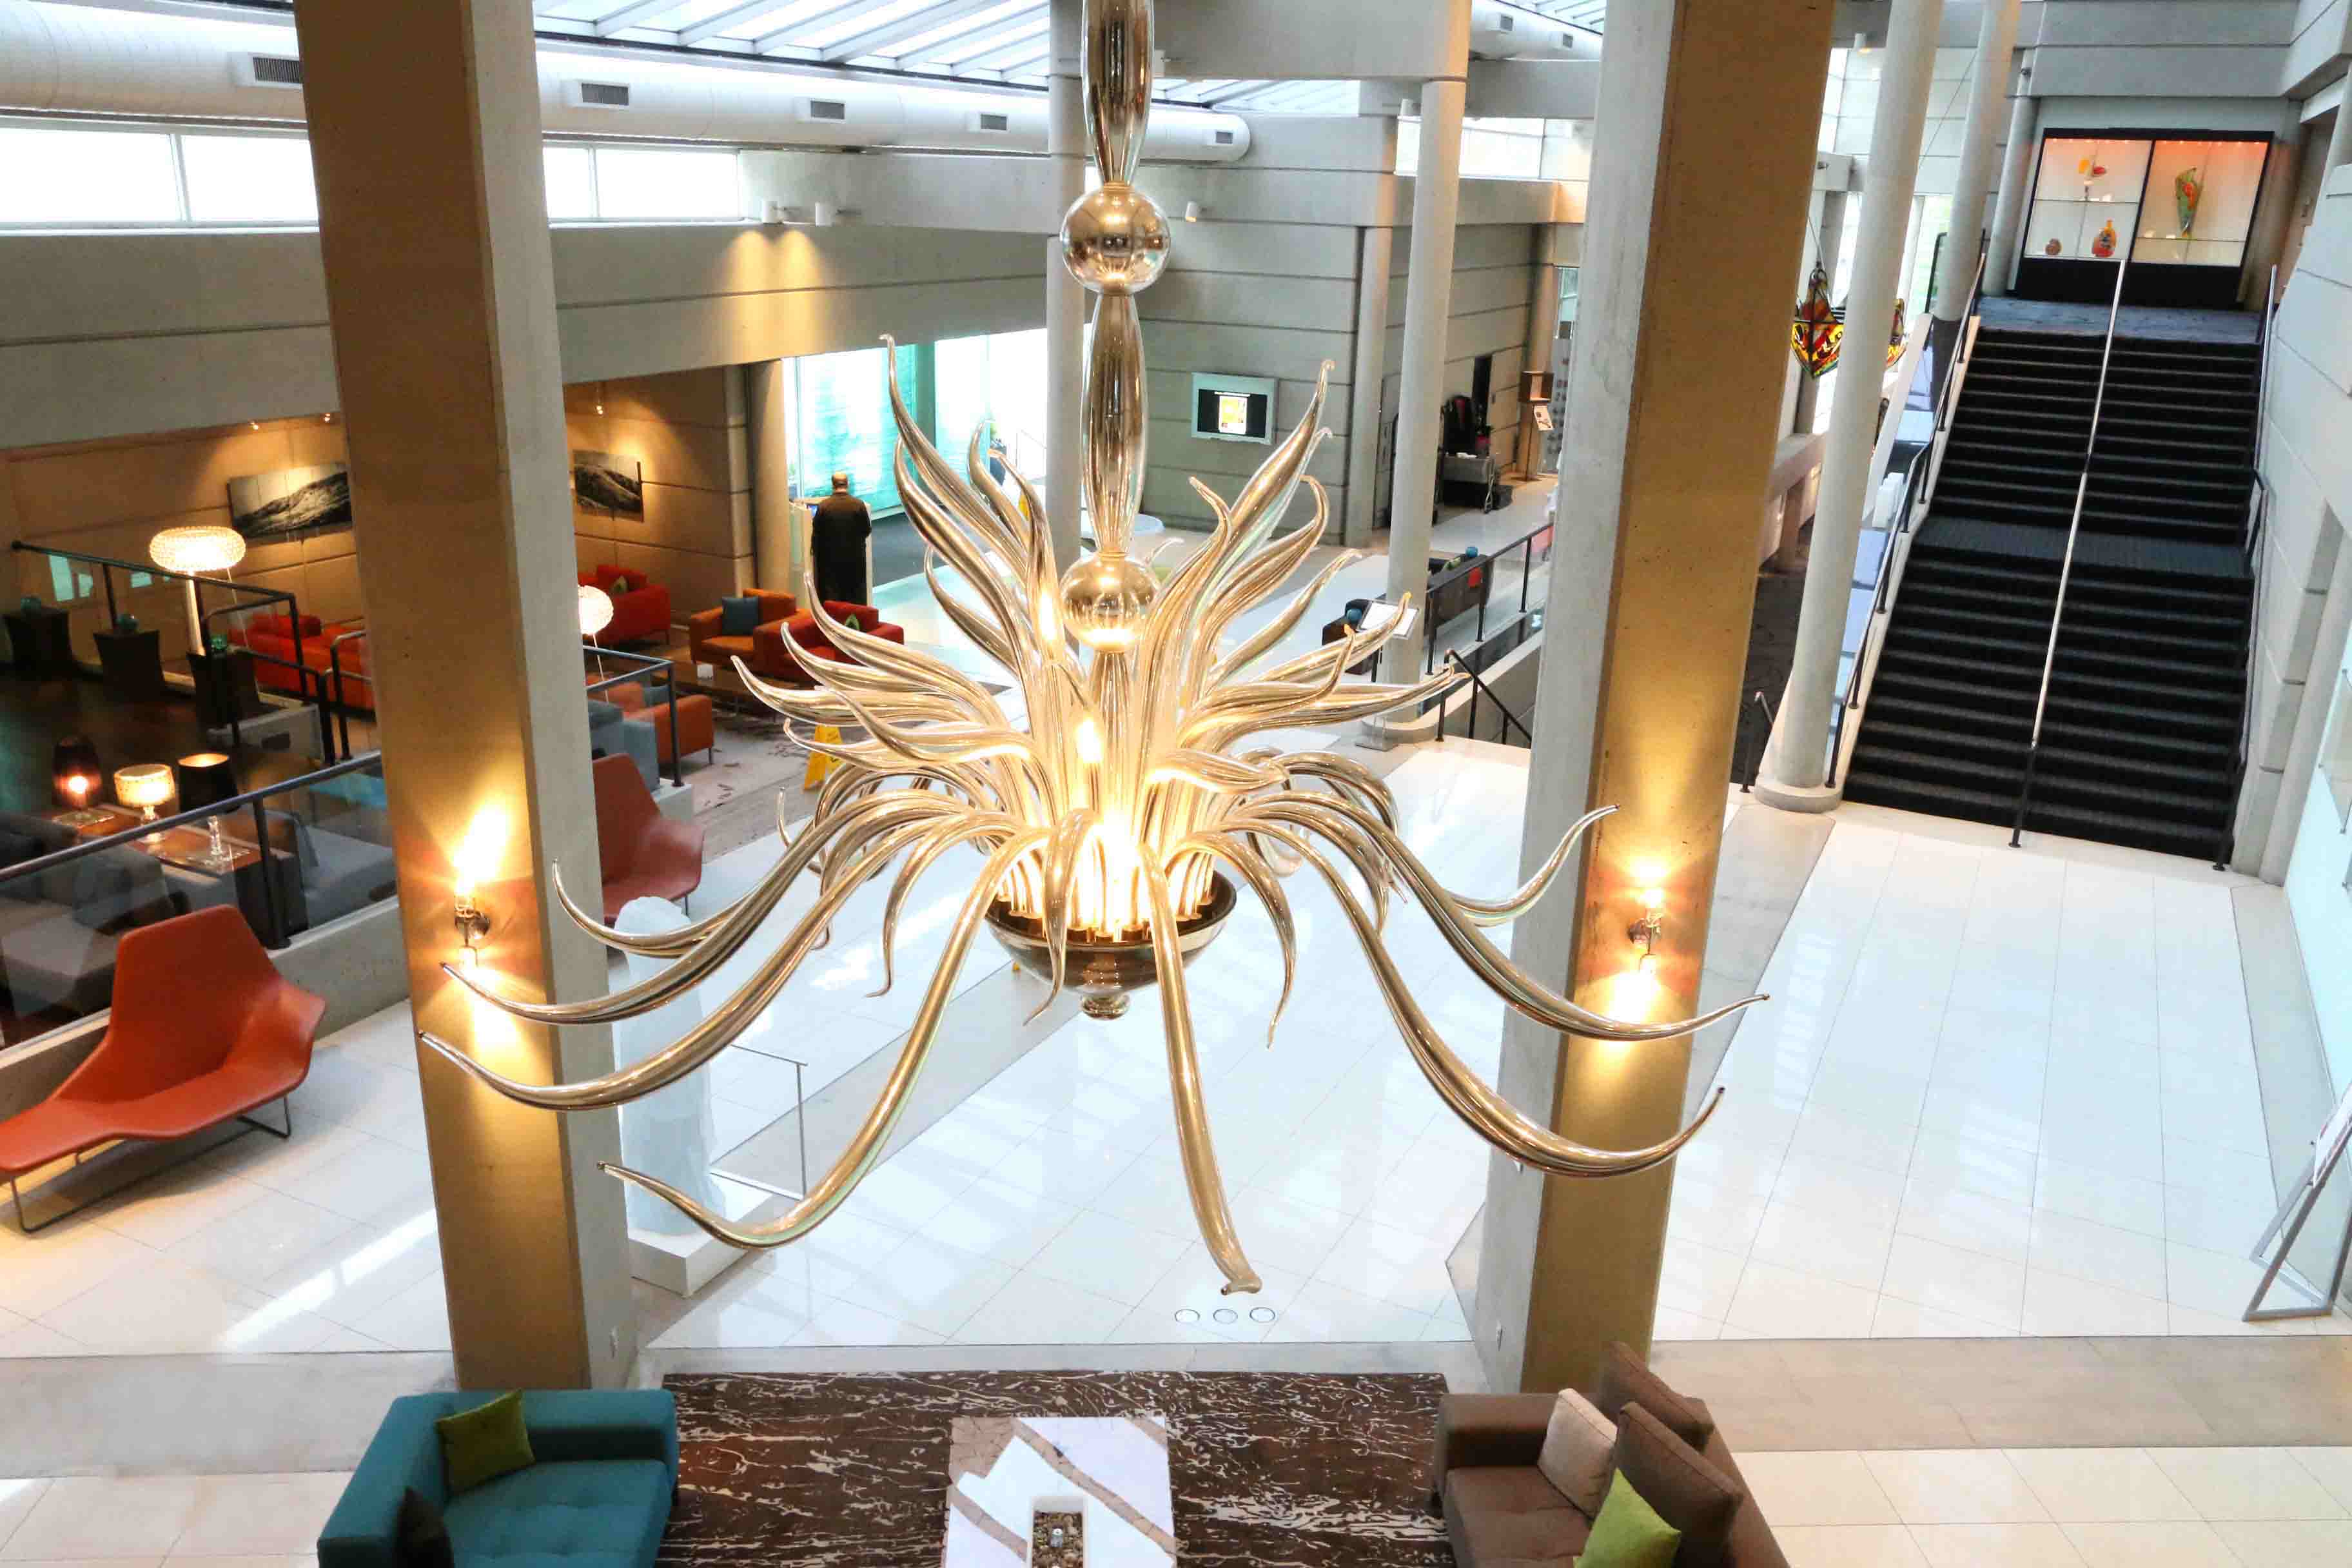 Daring Gourmet Getaways Hotel Murano Tacoma Wa The Daring Gourmet